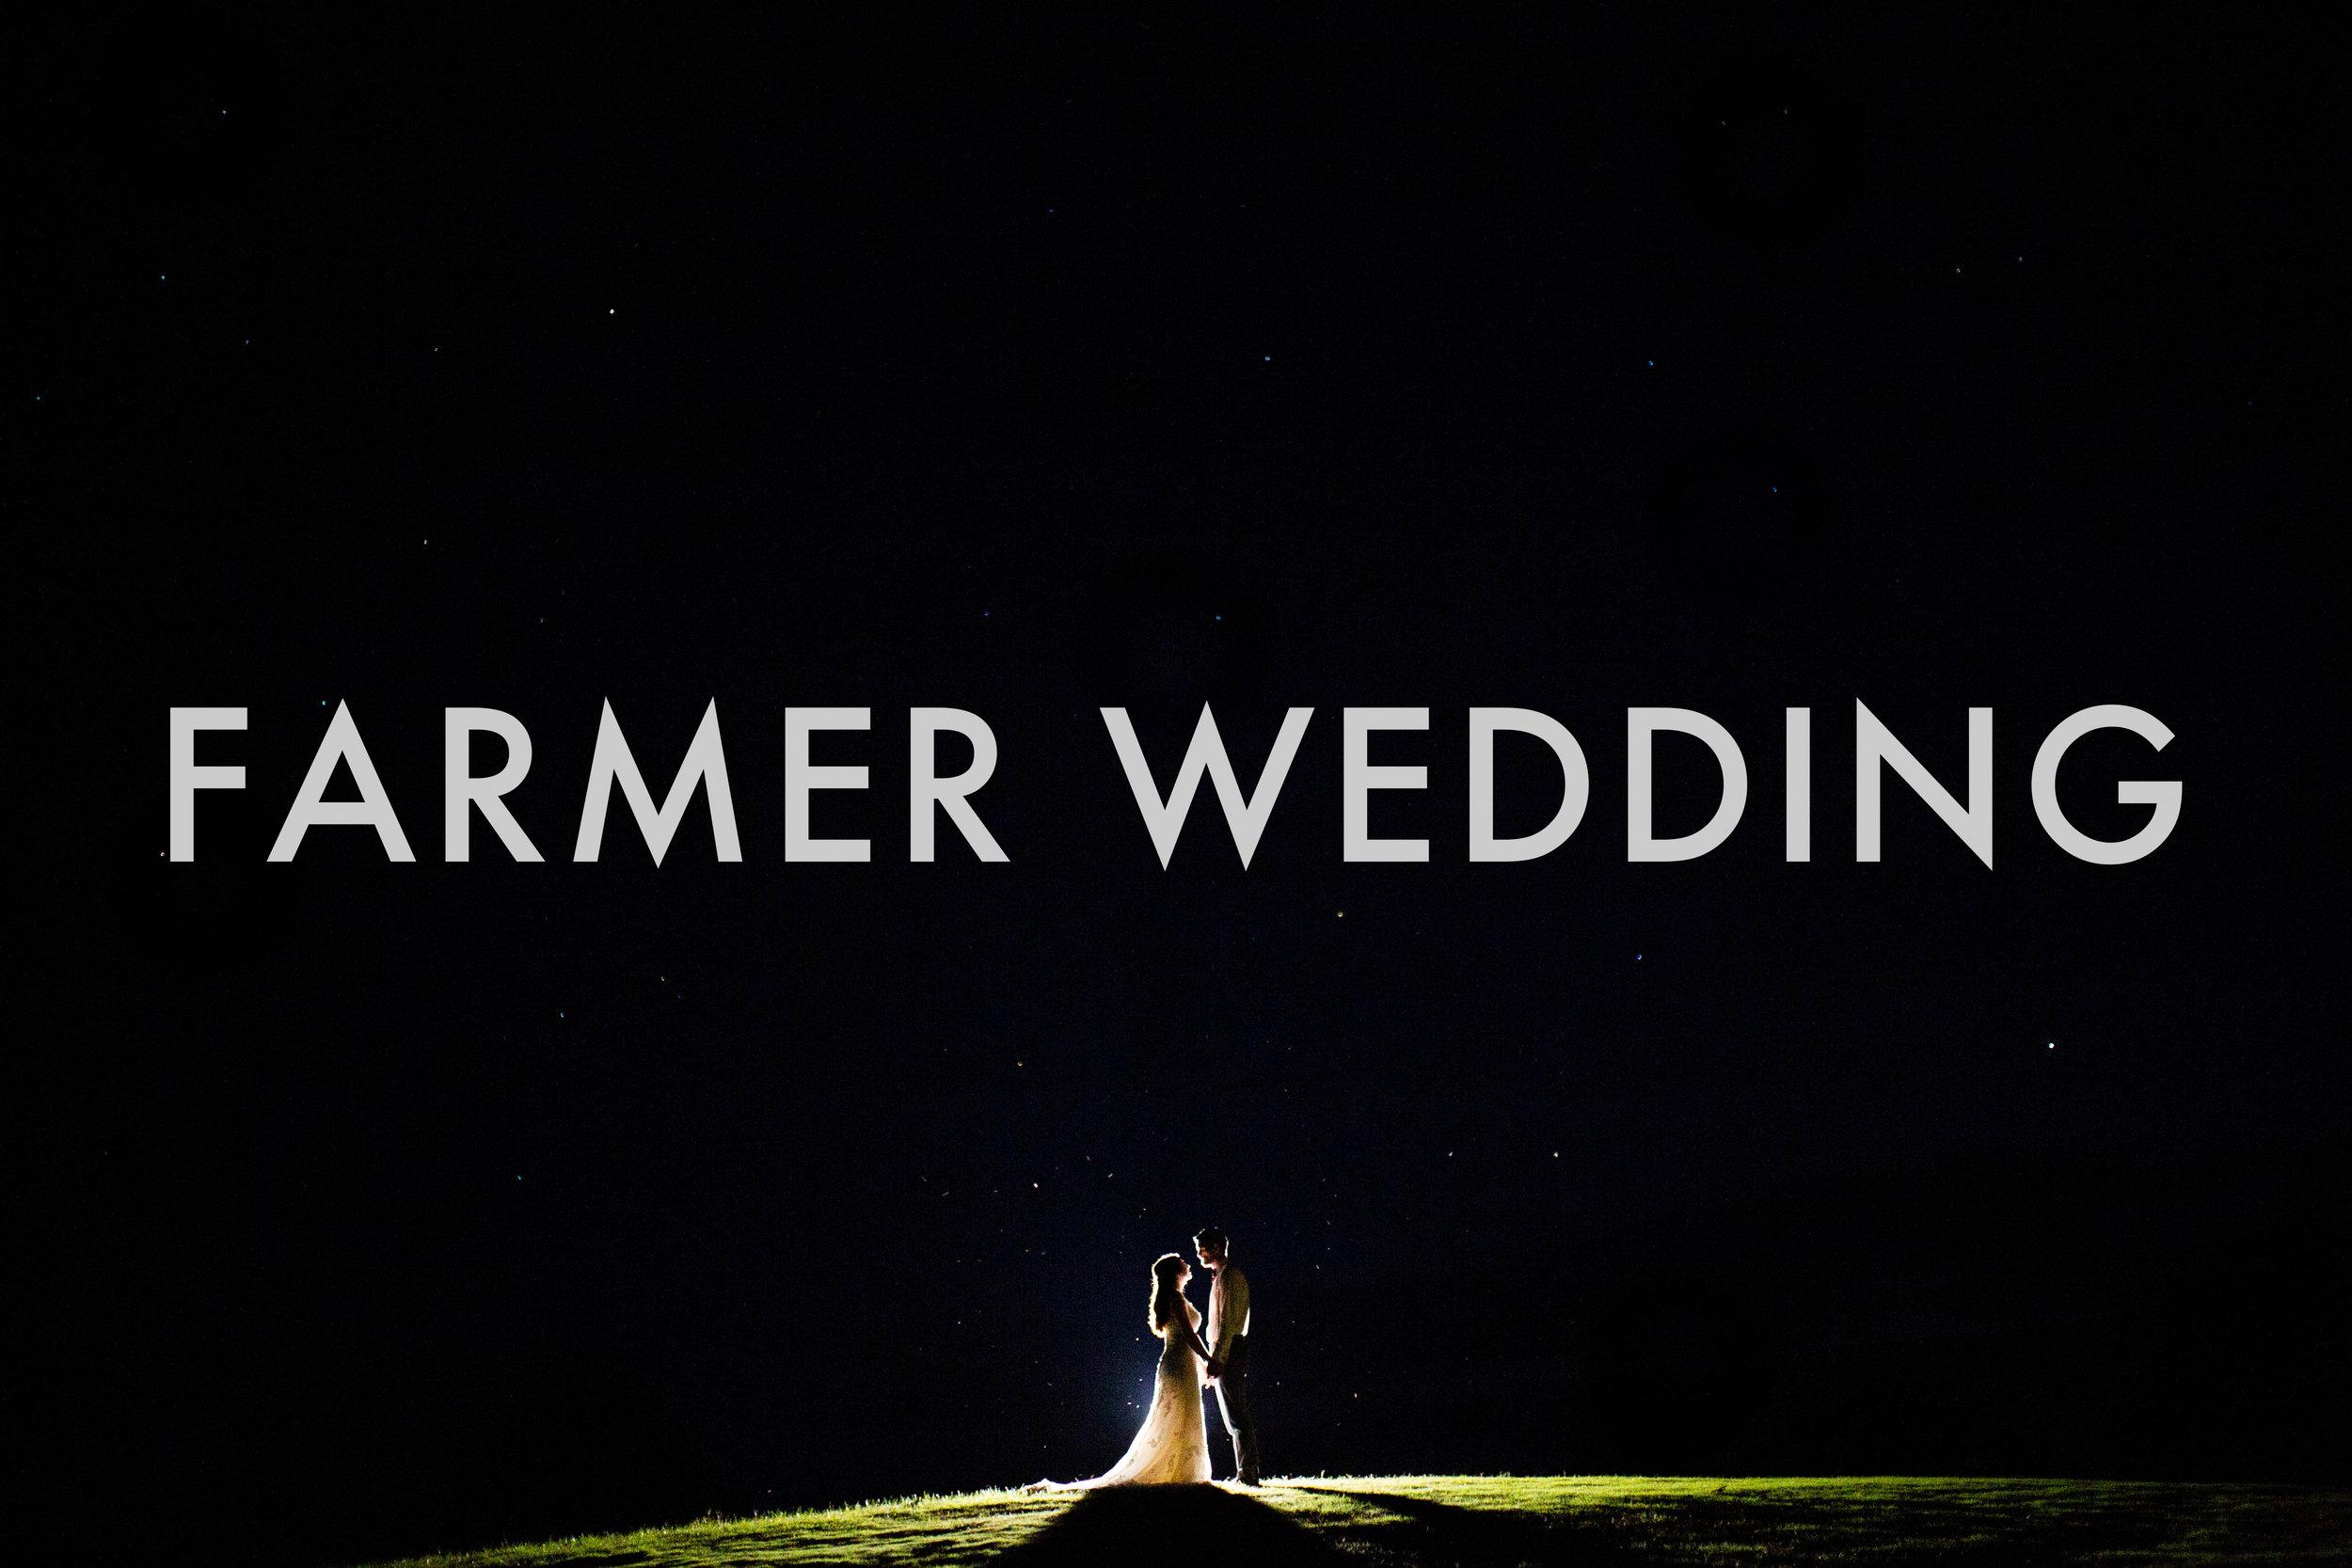 farmer-wedding-new-york-city-wedding-photographer-stephanie-hanson-photo